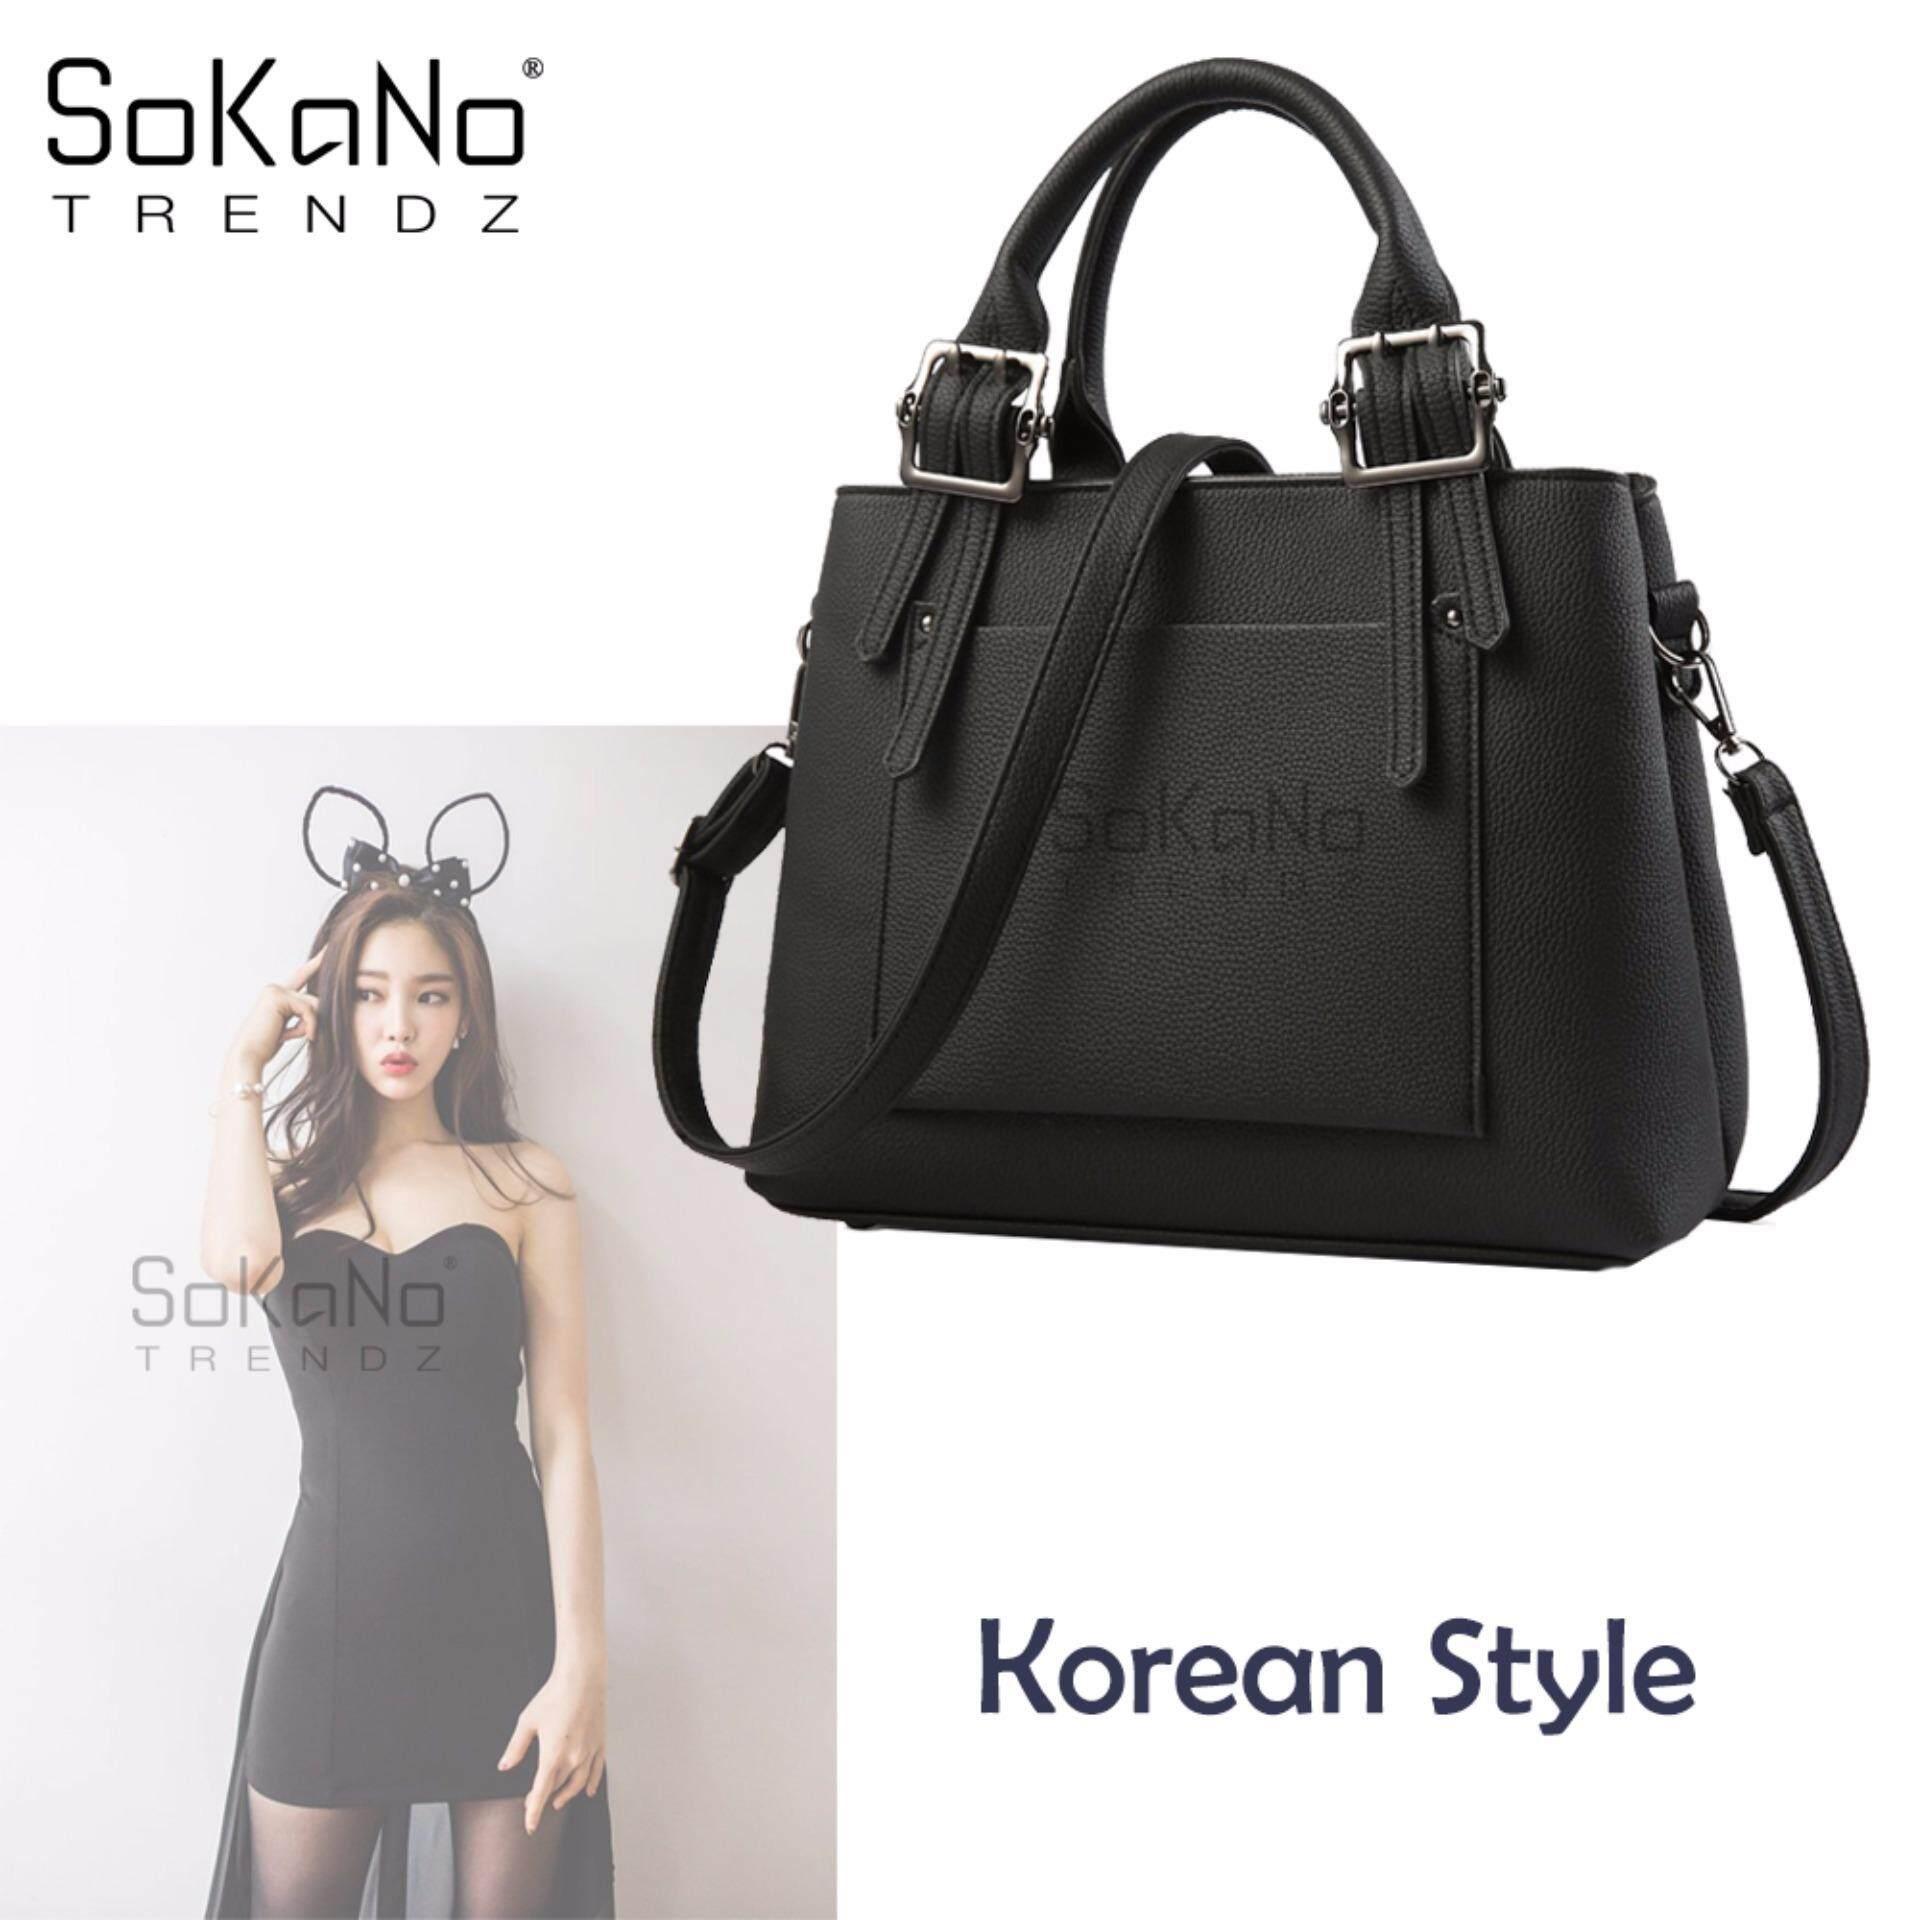 SoKaNo Trendz SKN838 Korean Style Shoulder PU Leather Tote Bag Handbeg Wanita- Black